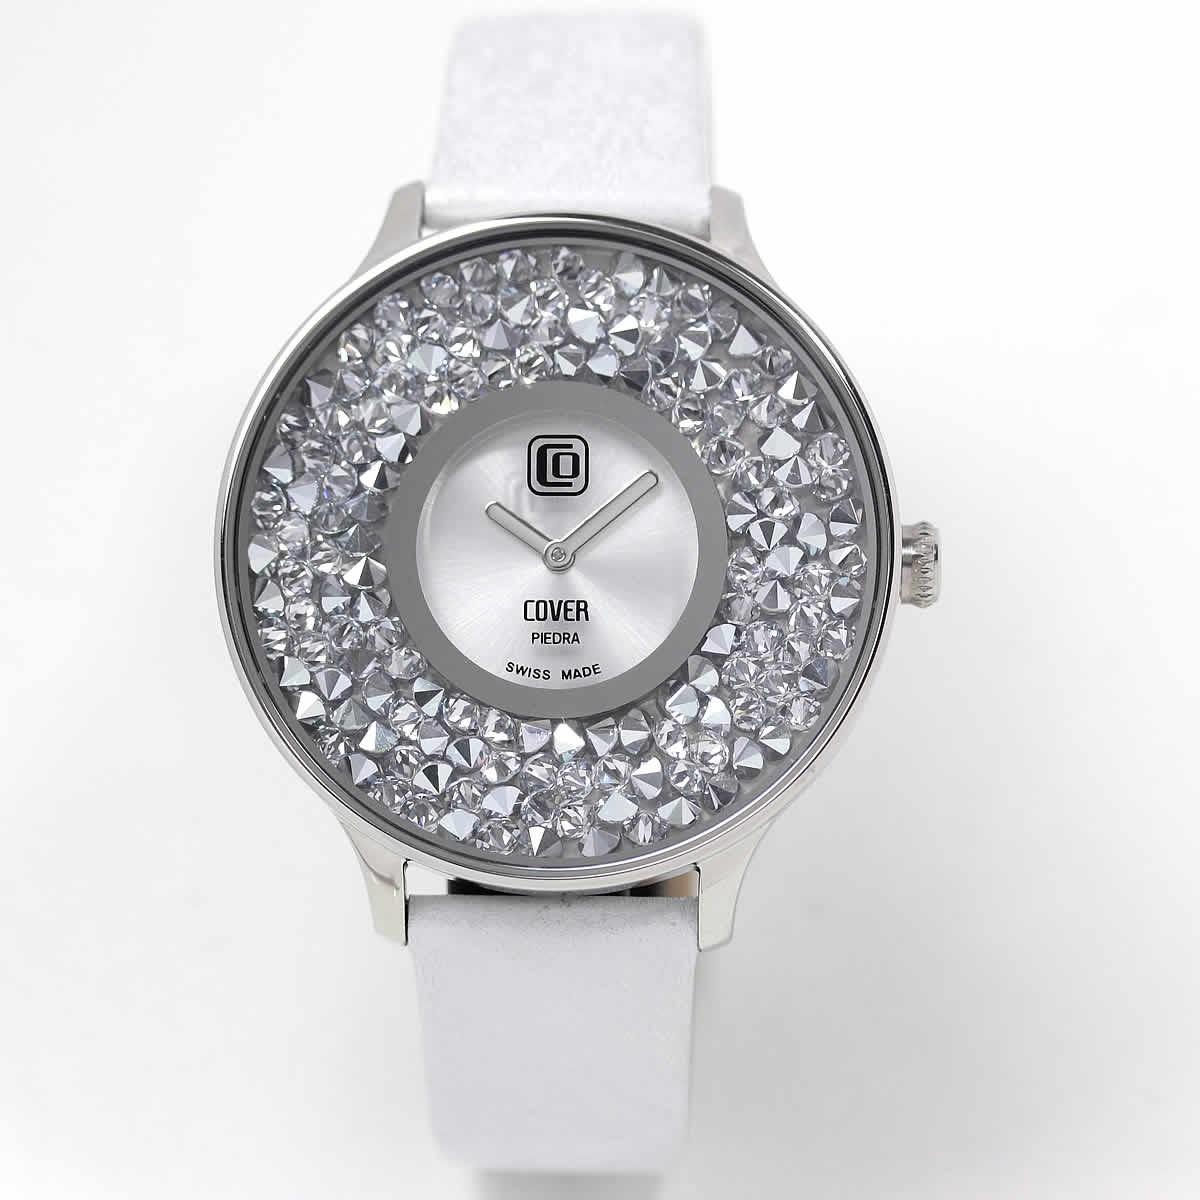 「COVER(コヴァ) TREND PIEDRA Co158.01 ホワイト 女性用腕時計